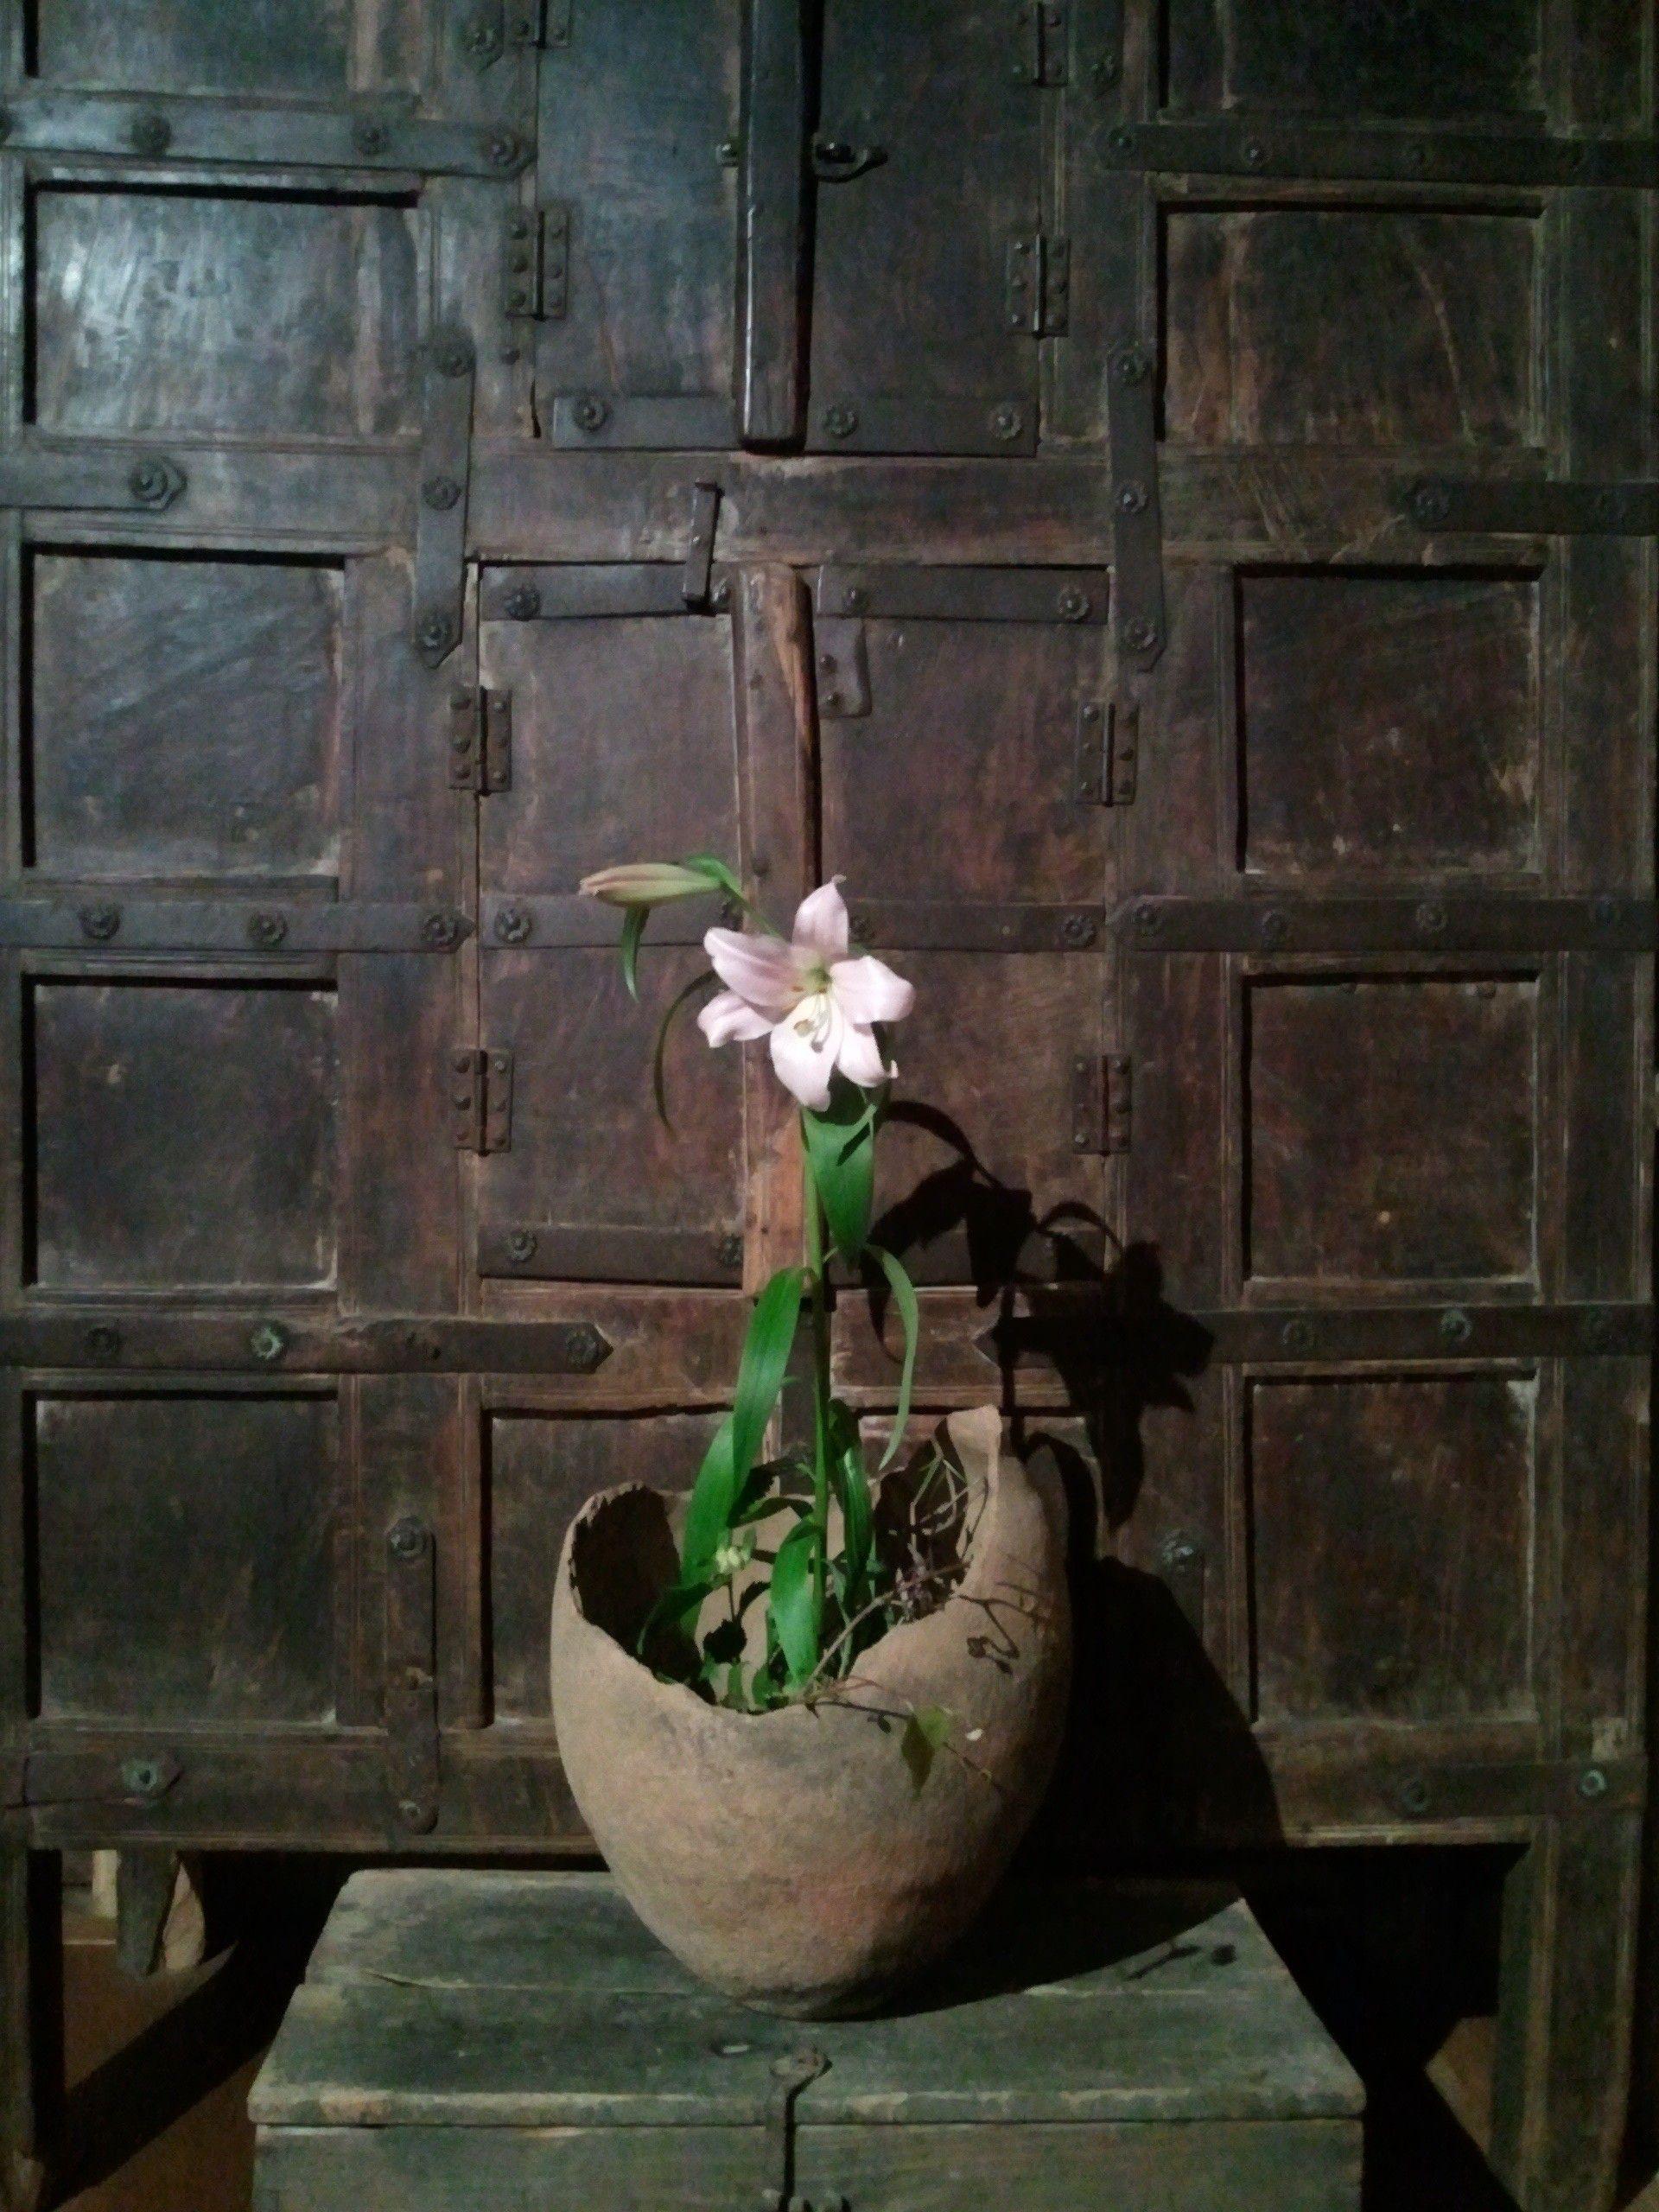 ikebana flower arrangement in clay pot by Yuji Ueno wabisabi